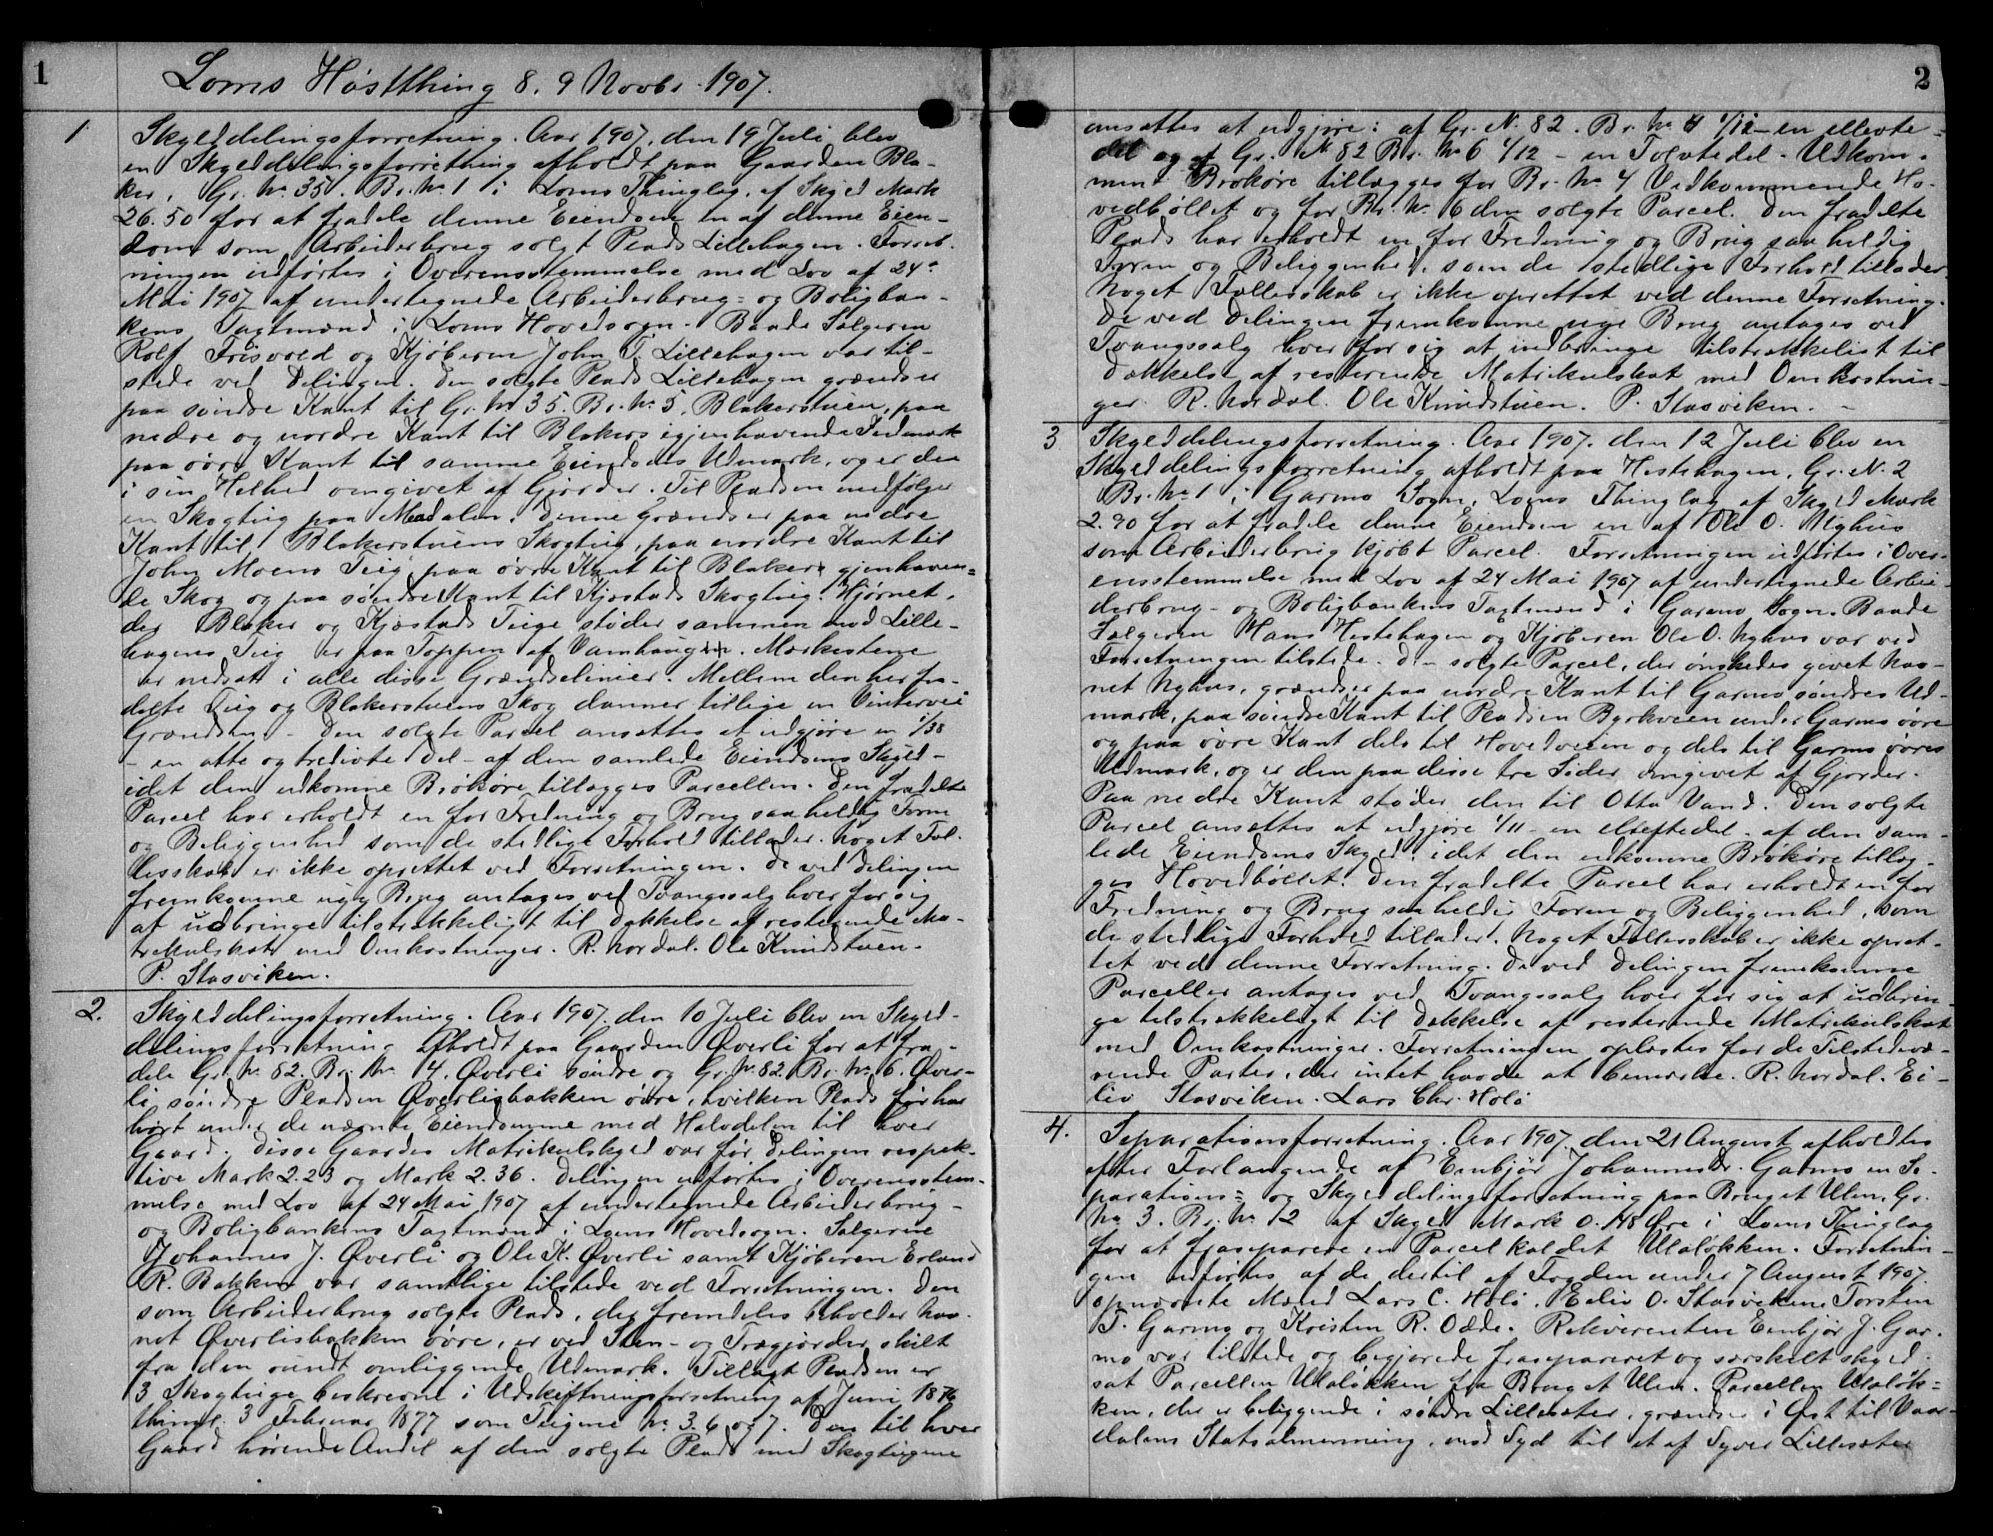 SAH, Nord-Gudbrandsdal tingrett, H/Hb/Hba/L0016: Pantebok nr. 16, 1907-1910, s. 1-2